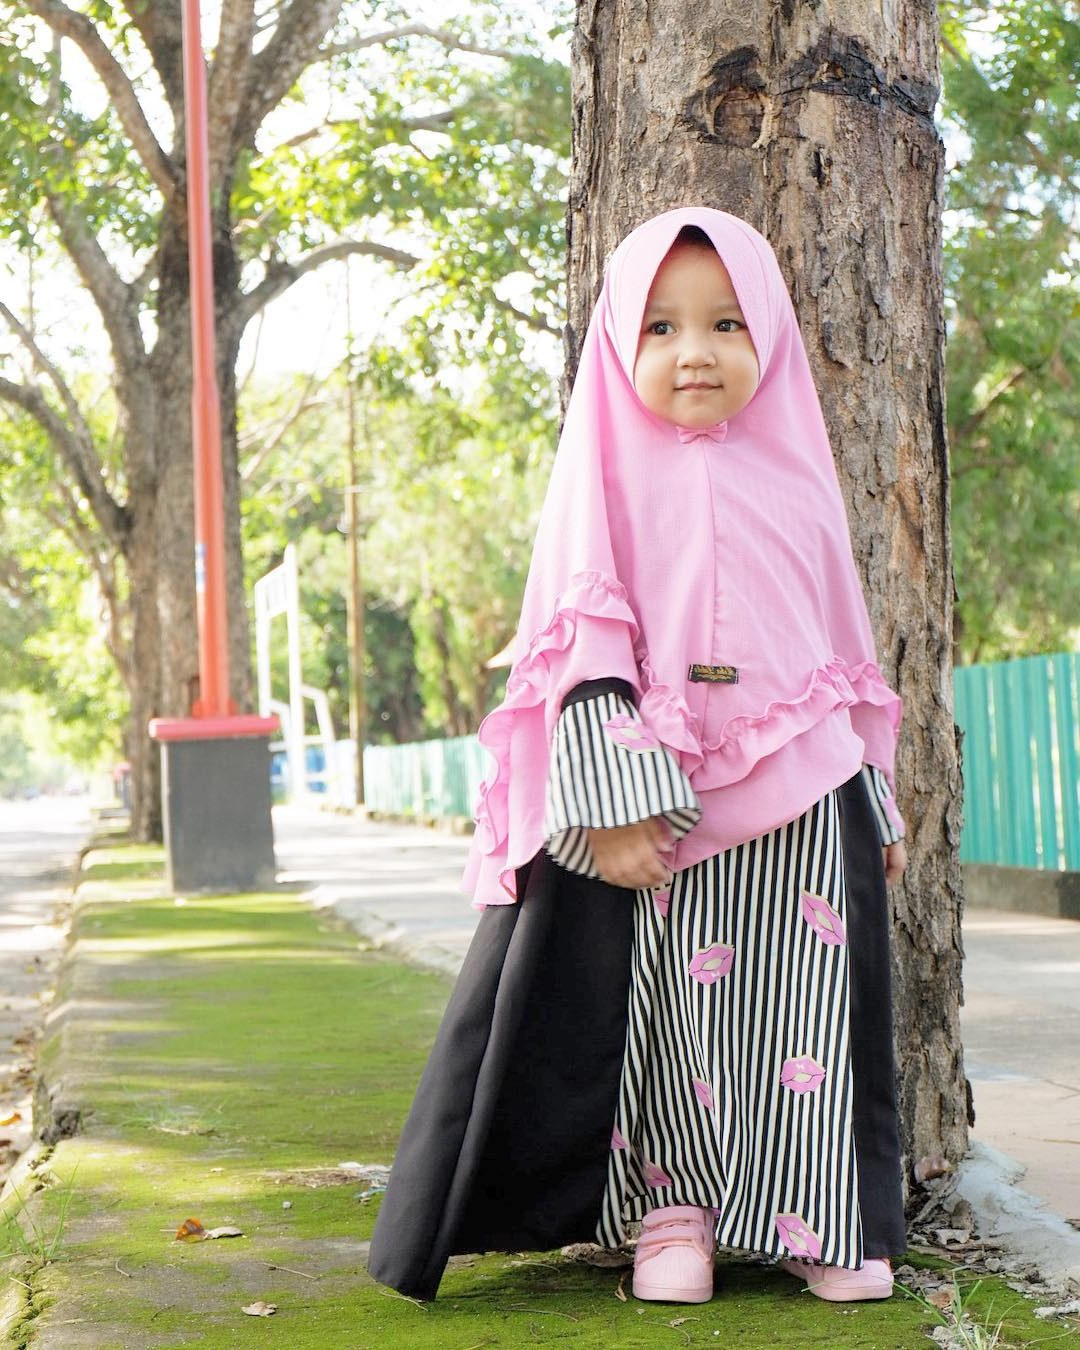 Design Baju Lebaran Anak Perempuan Zwd9 Cara Mudah Memilih Baju Untuk Lebaran Anak Perempuan Yang